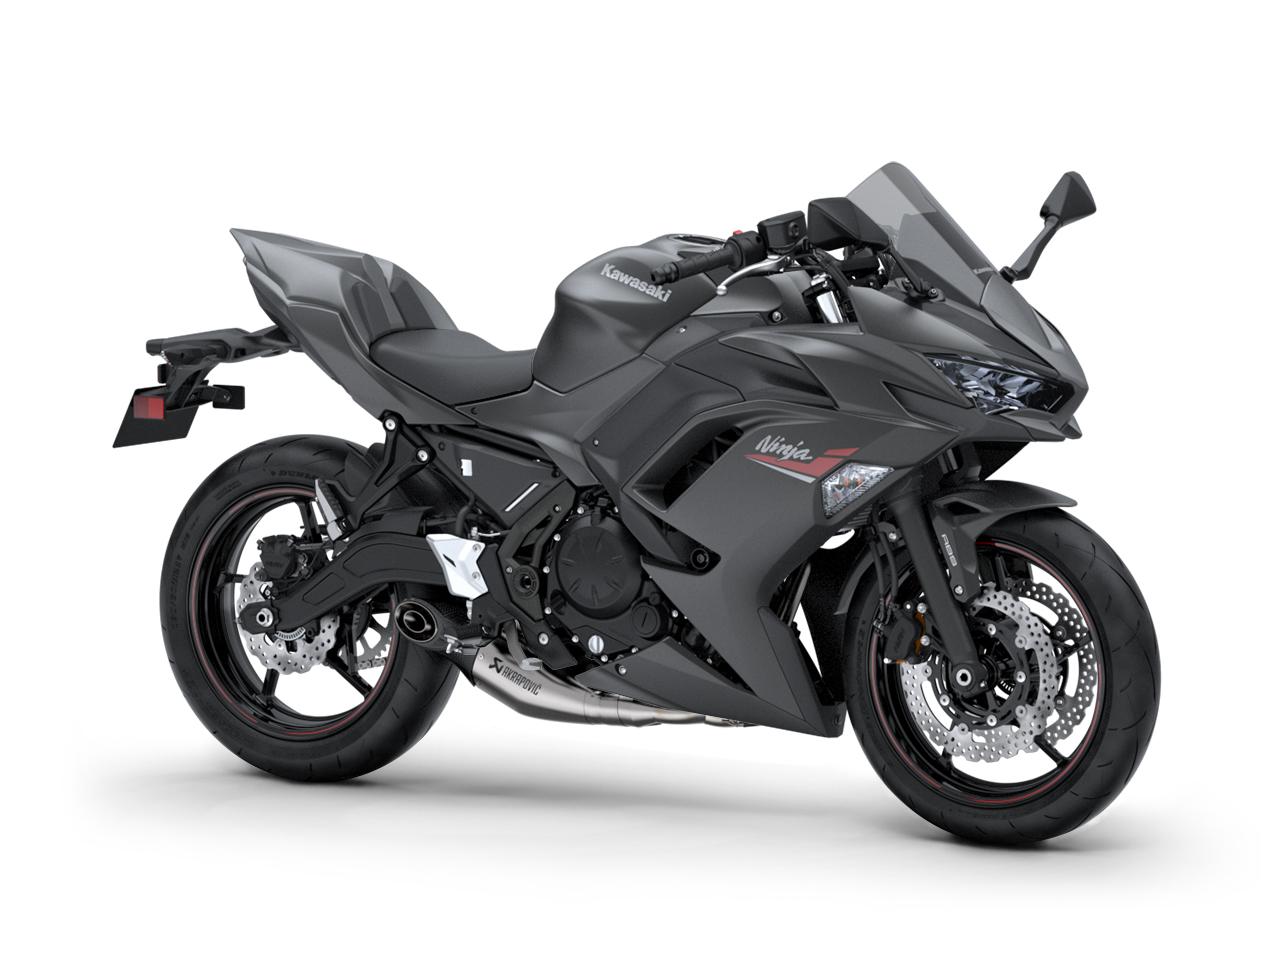 Precios de Kawasaki Ninja 650 Performance 2022